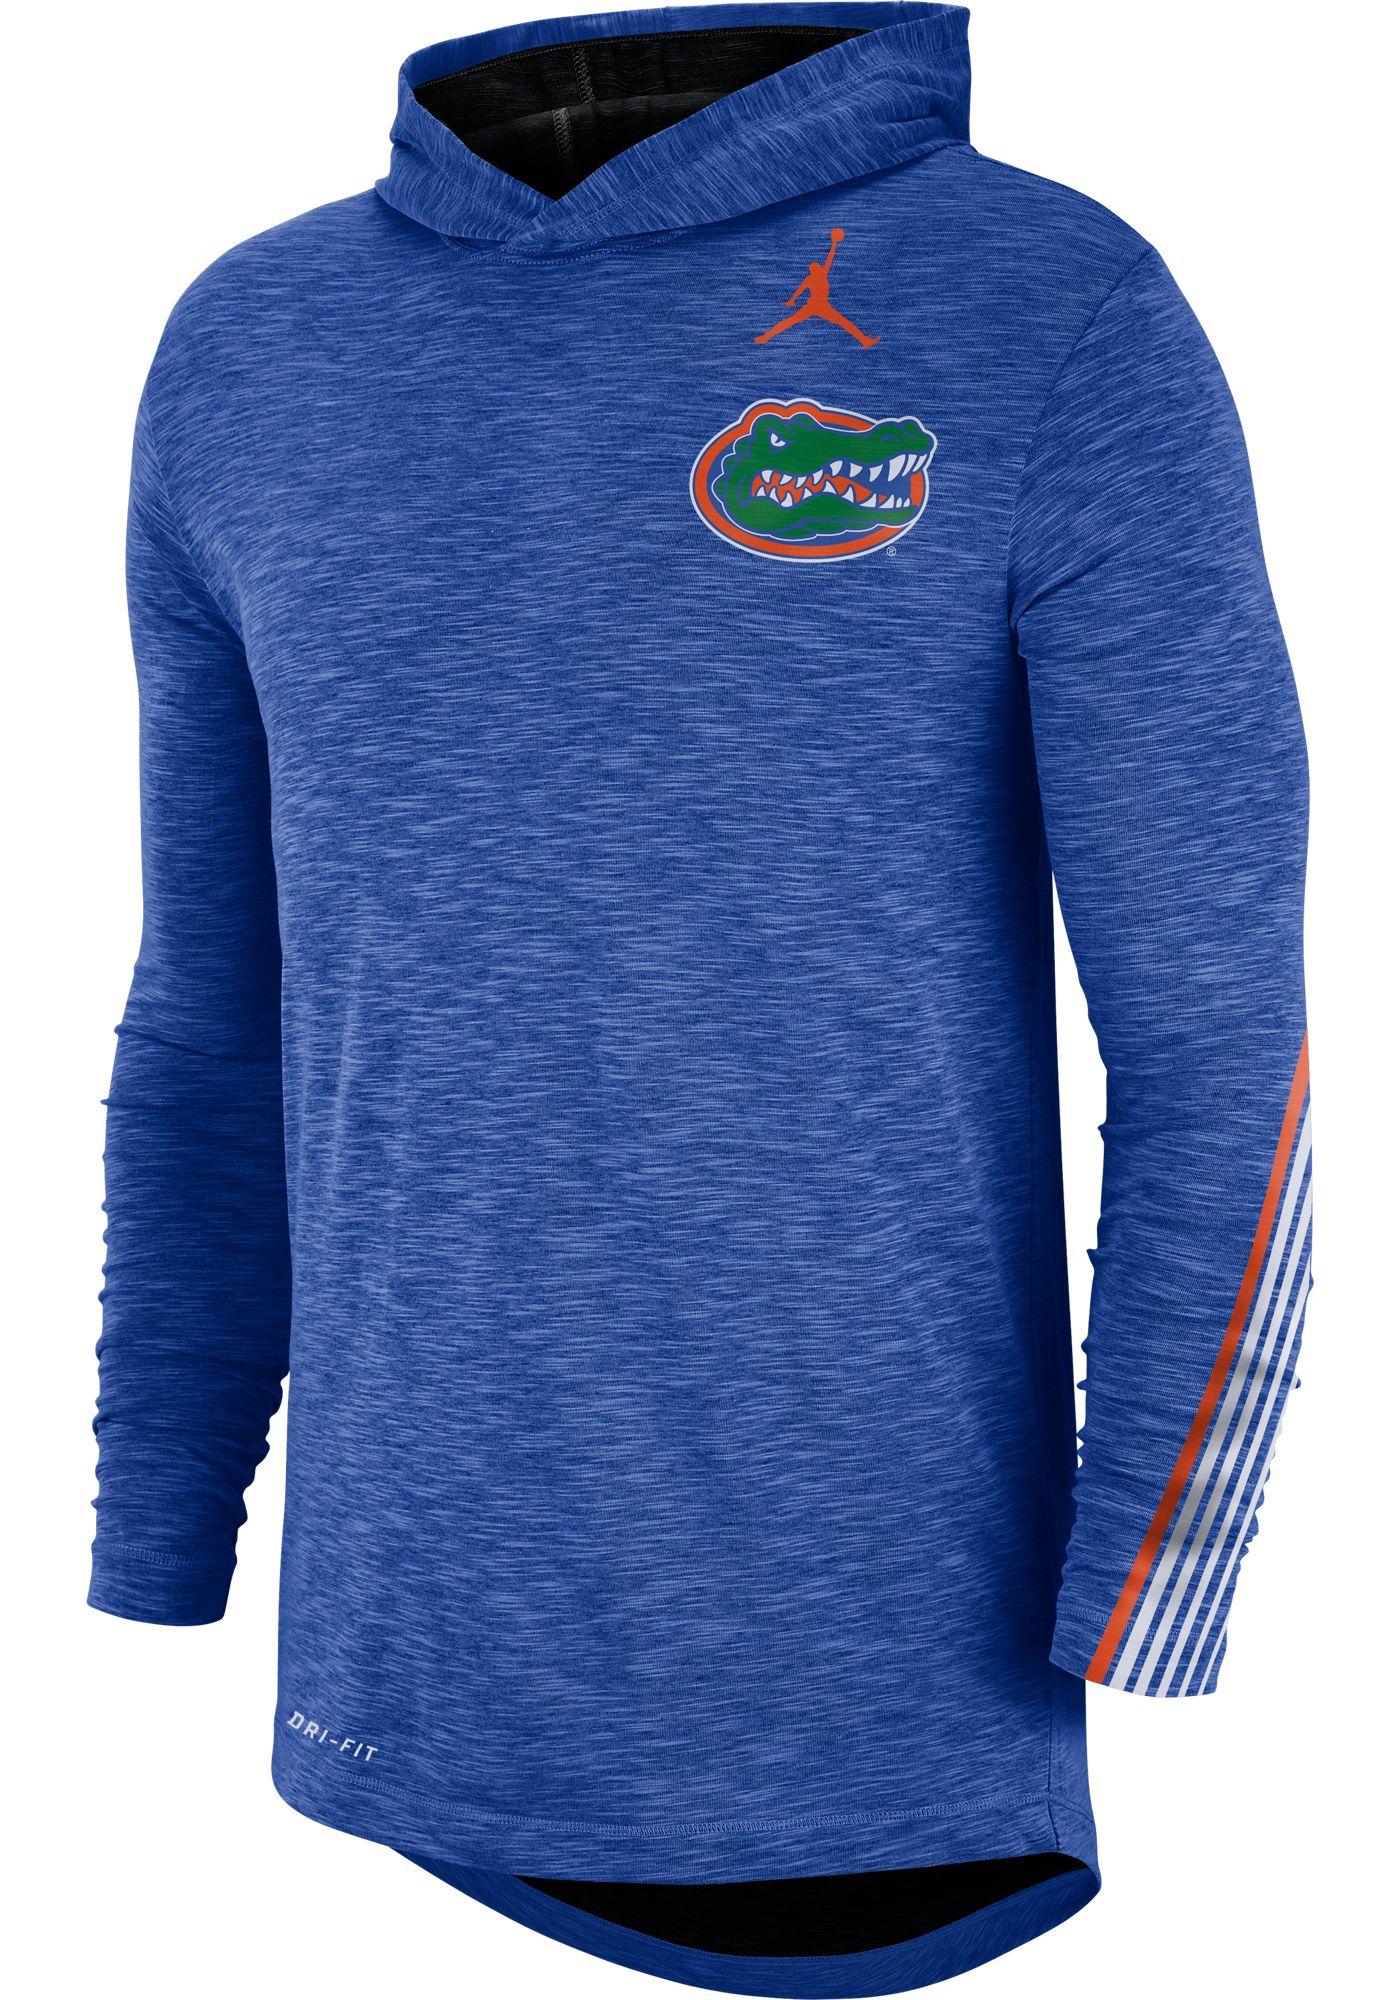 Jordan Men's Florida Gators Blue Cotton Long Sleeve Hoodie T-Shirt